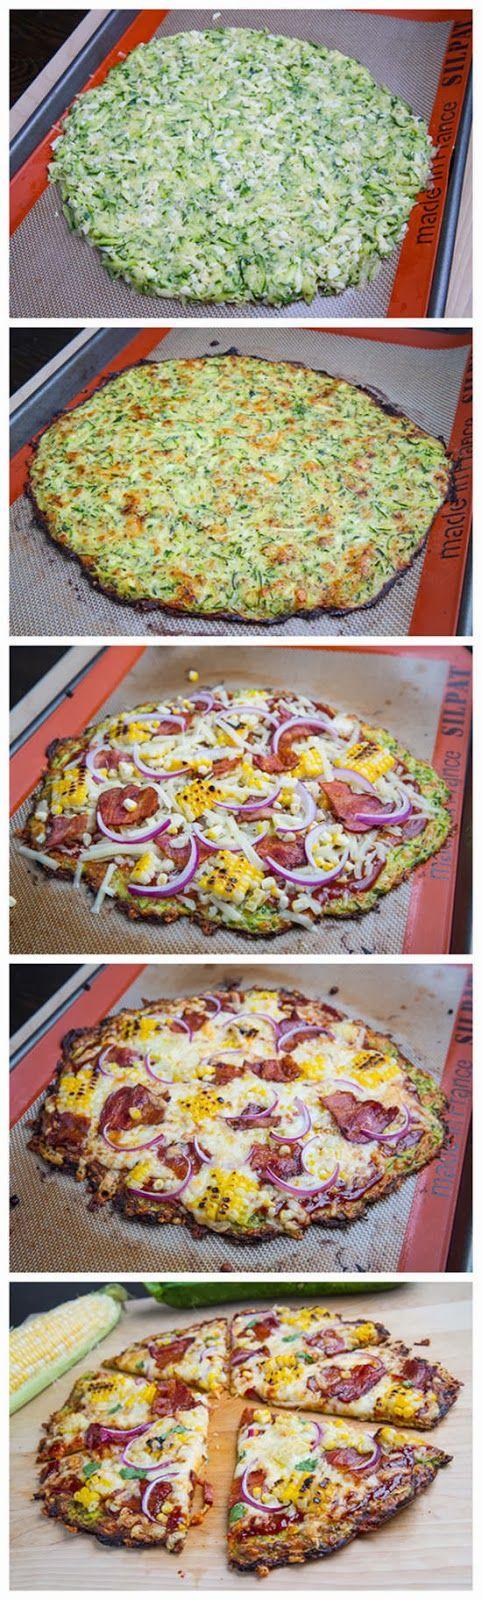 Zucchini Pizza Crust ~  4 cups zucchini, 1/2 cup mozzarella,  1/4 cup parmigiano reggiano (parmesan), 1 egg, 1 teaspoon oregano or Italian seasoning, salt and pepper to taste